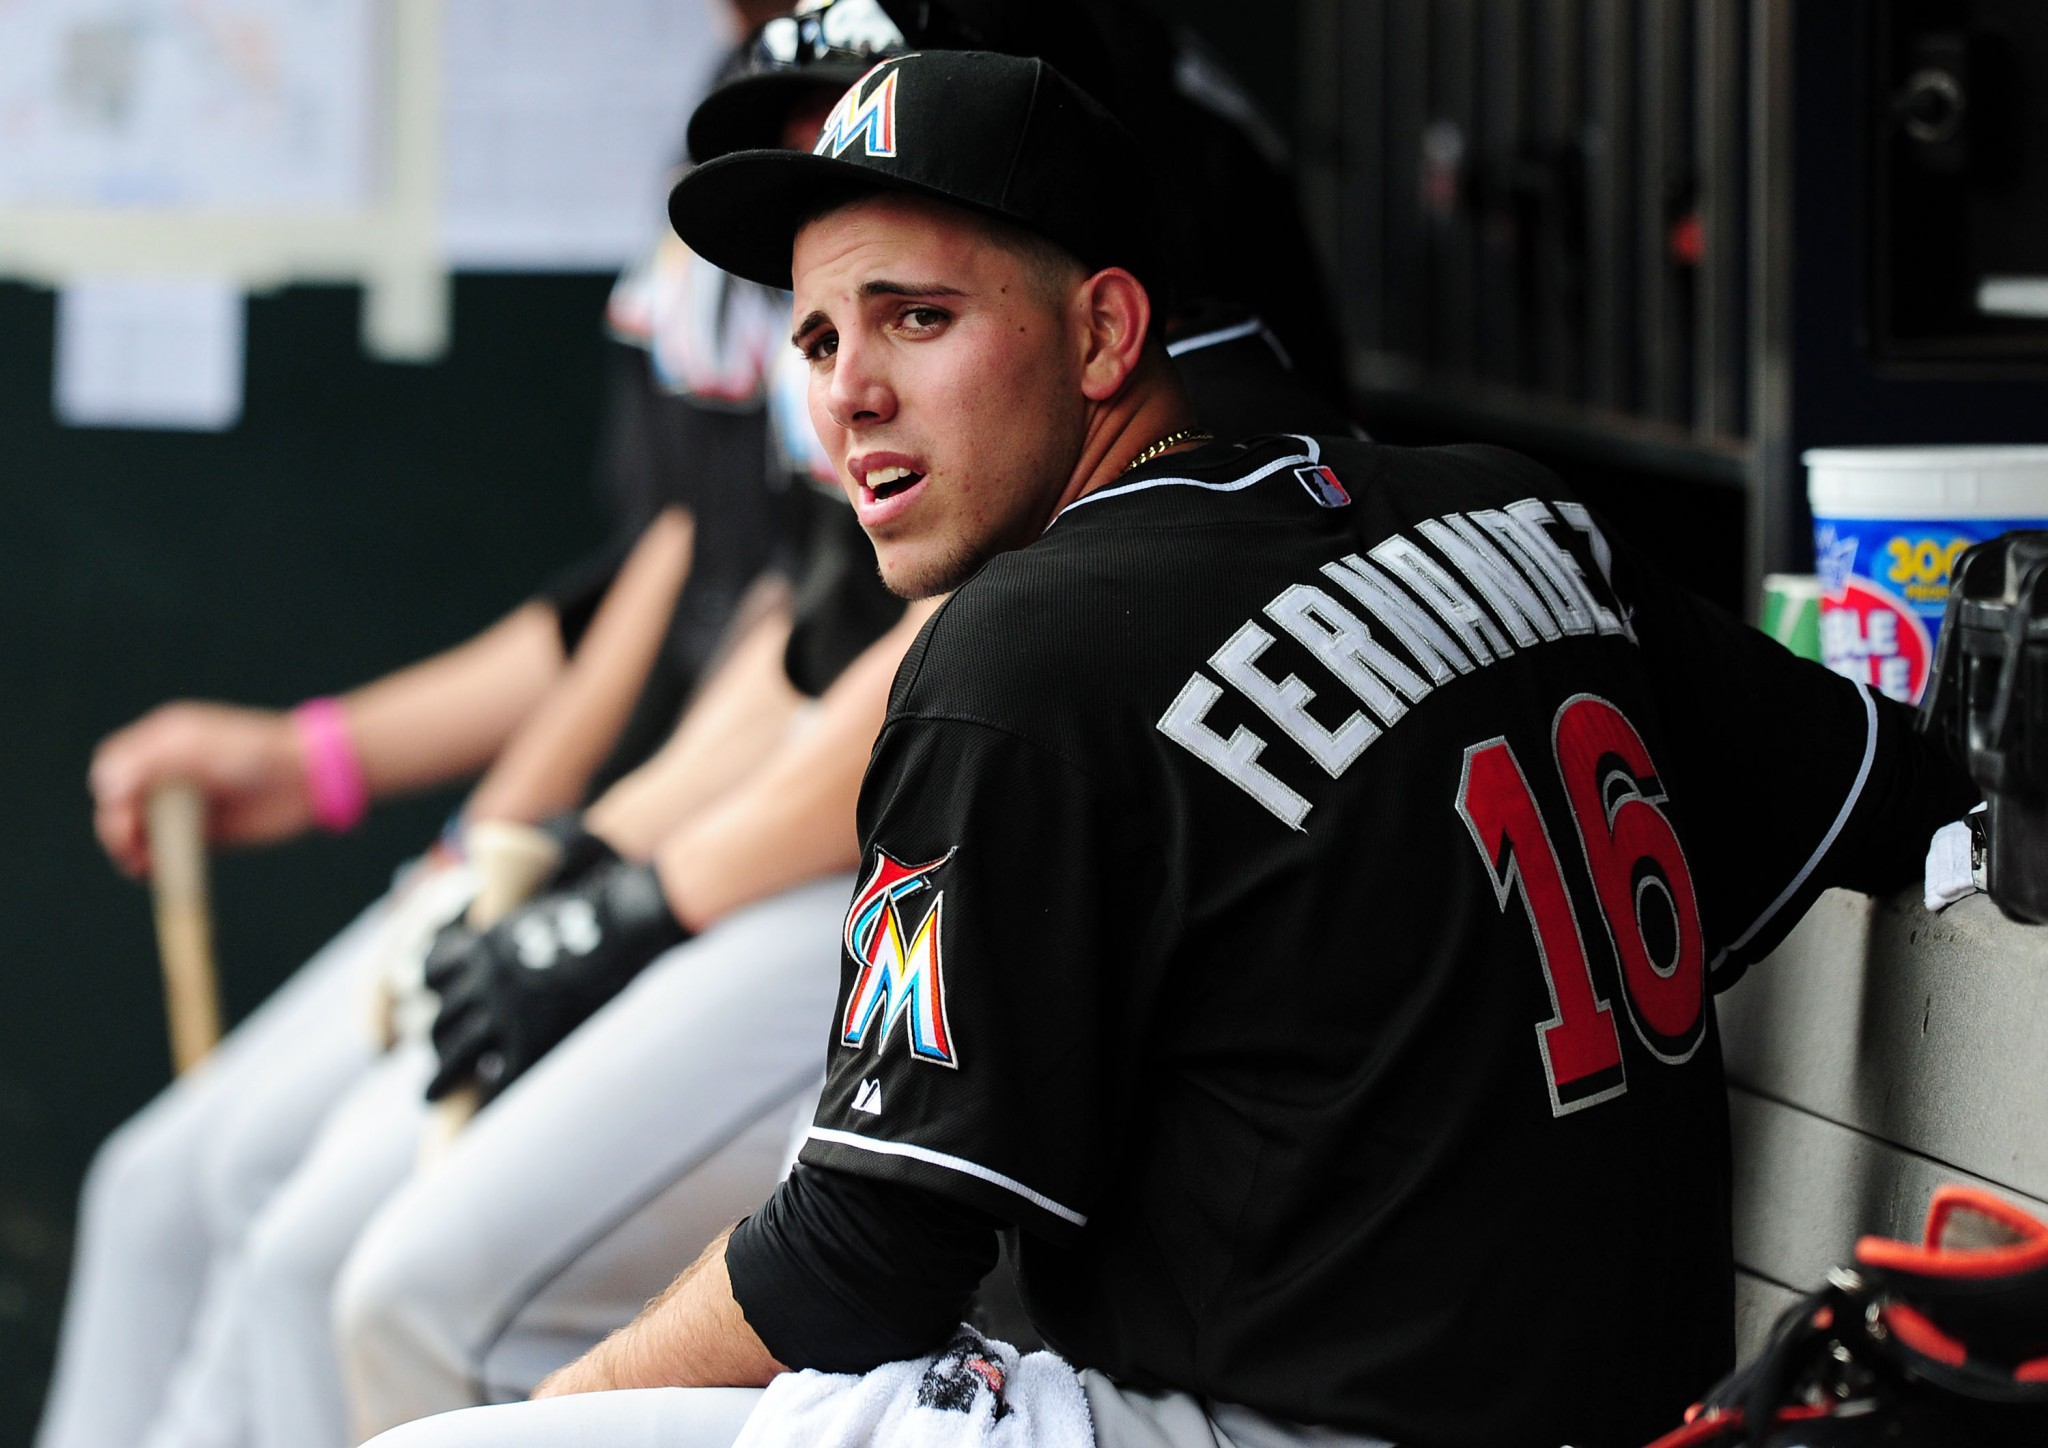 The tragic final night of Fernandez's life